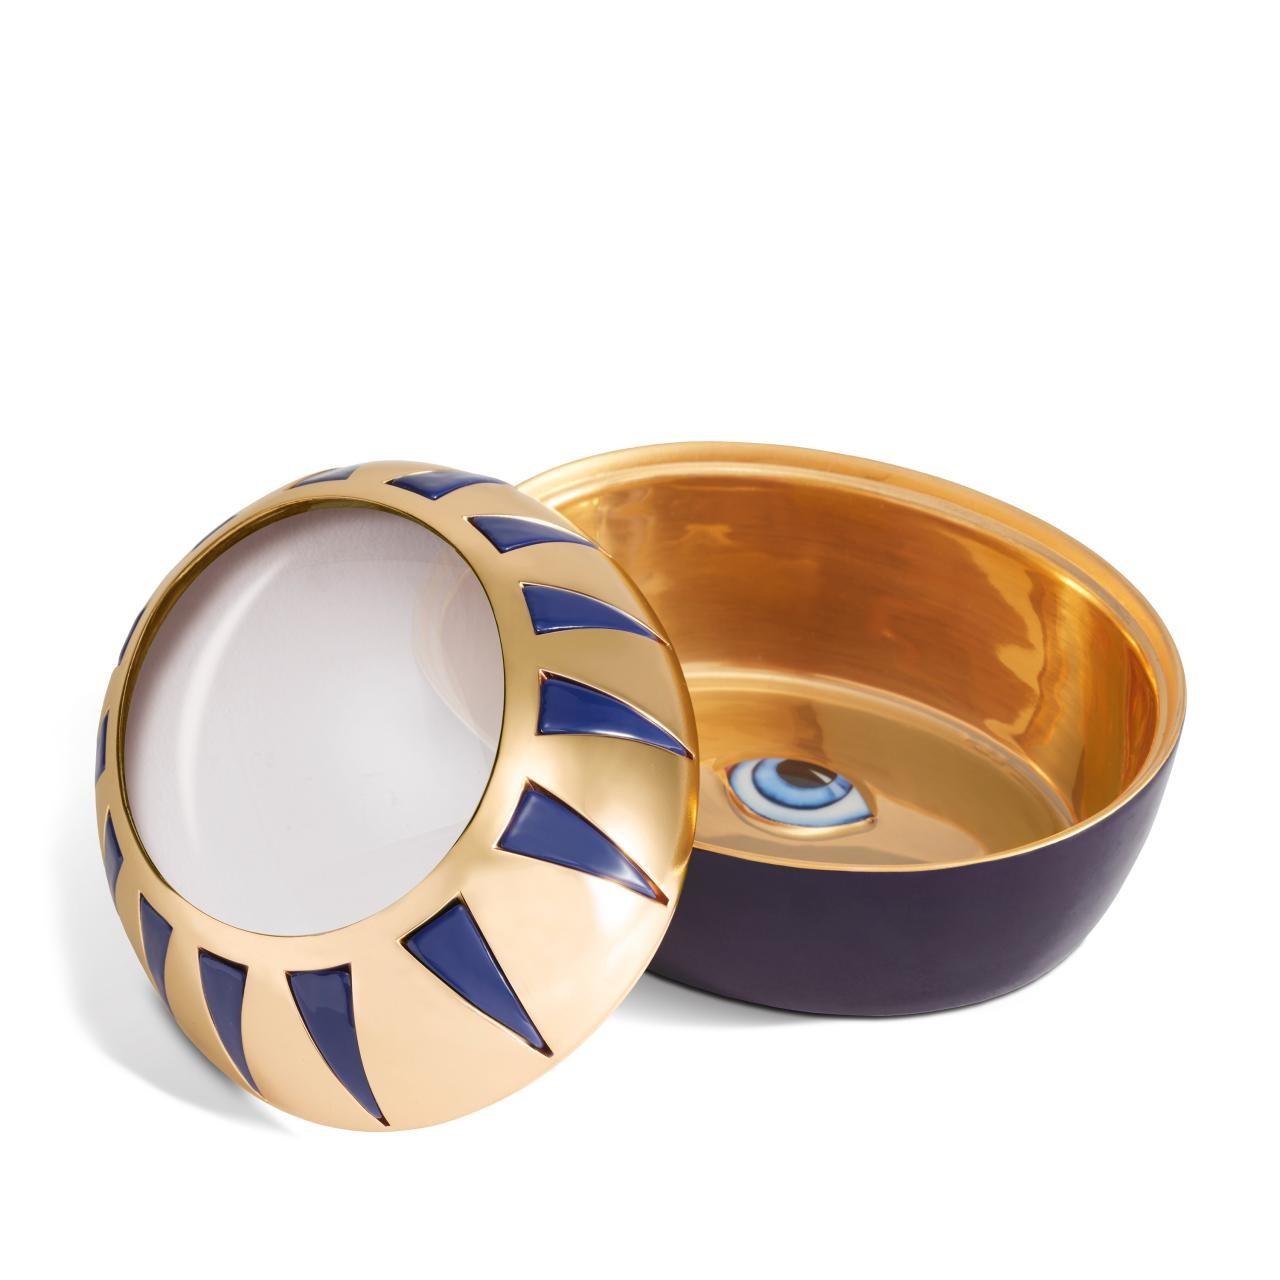 L'Objet I Lito Magnifying Glass Box